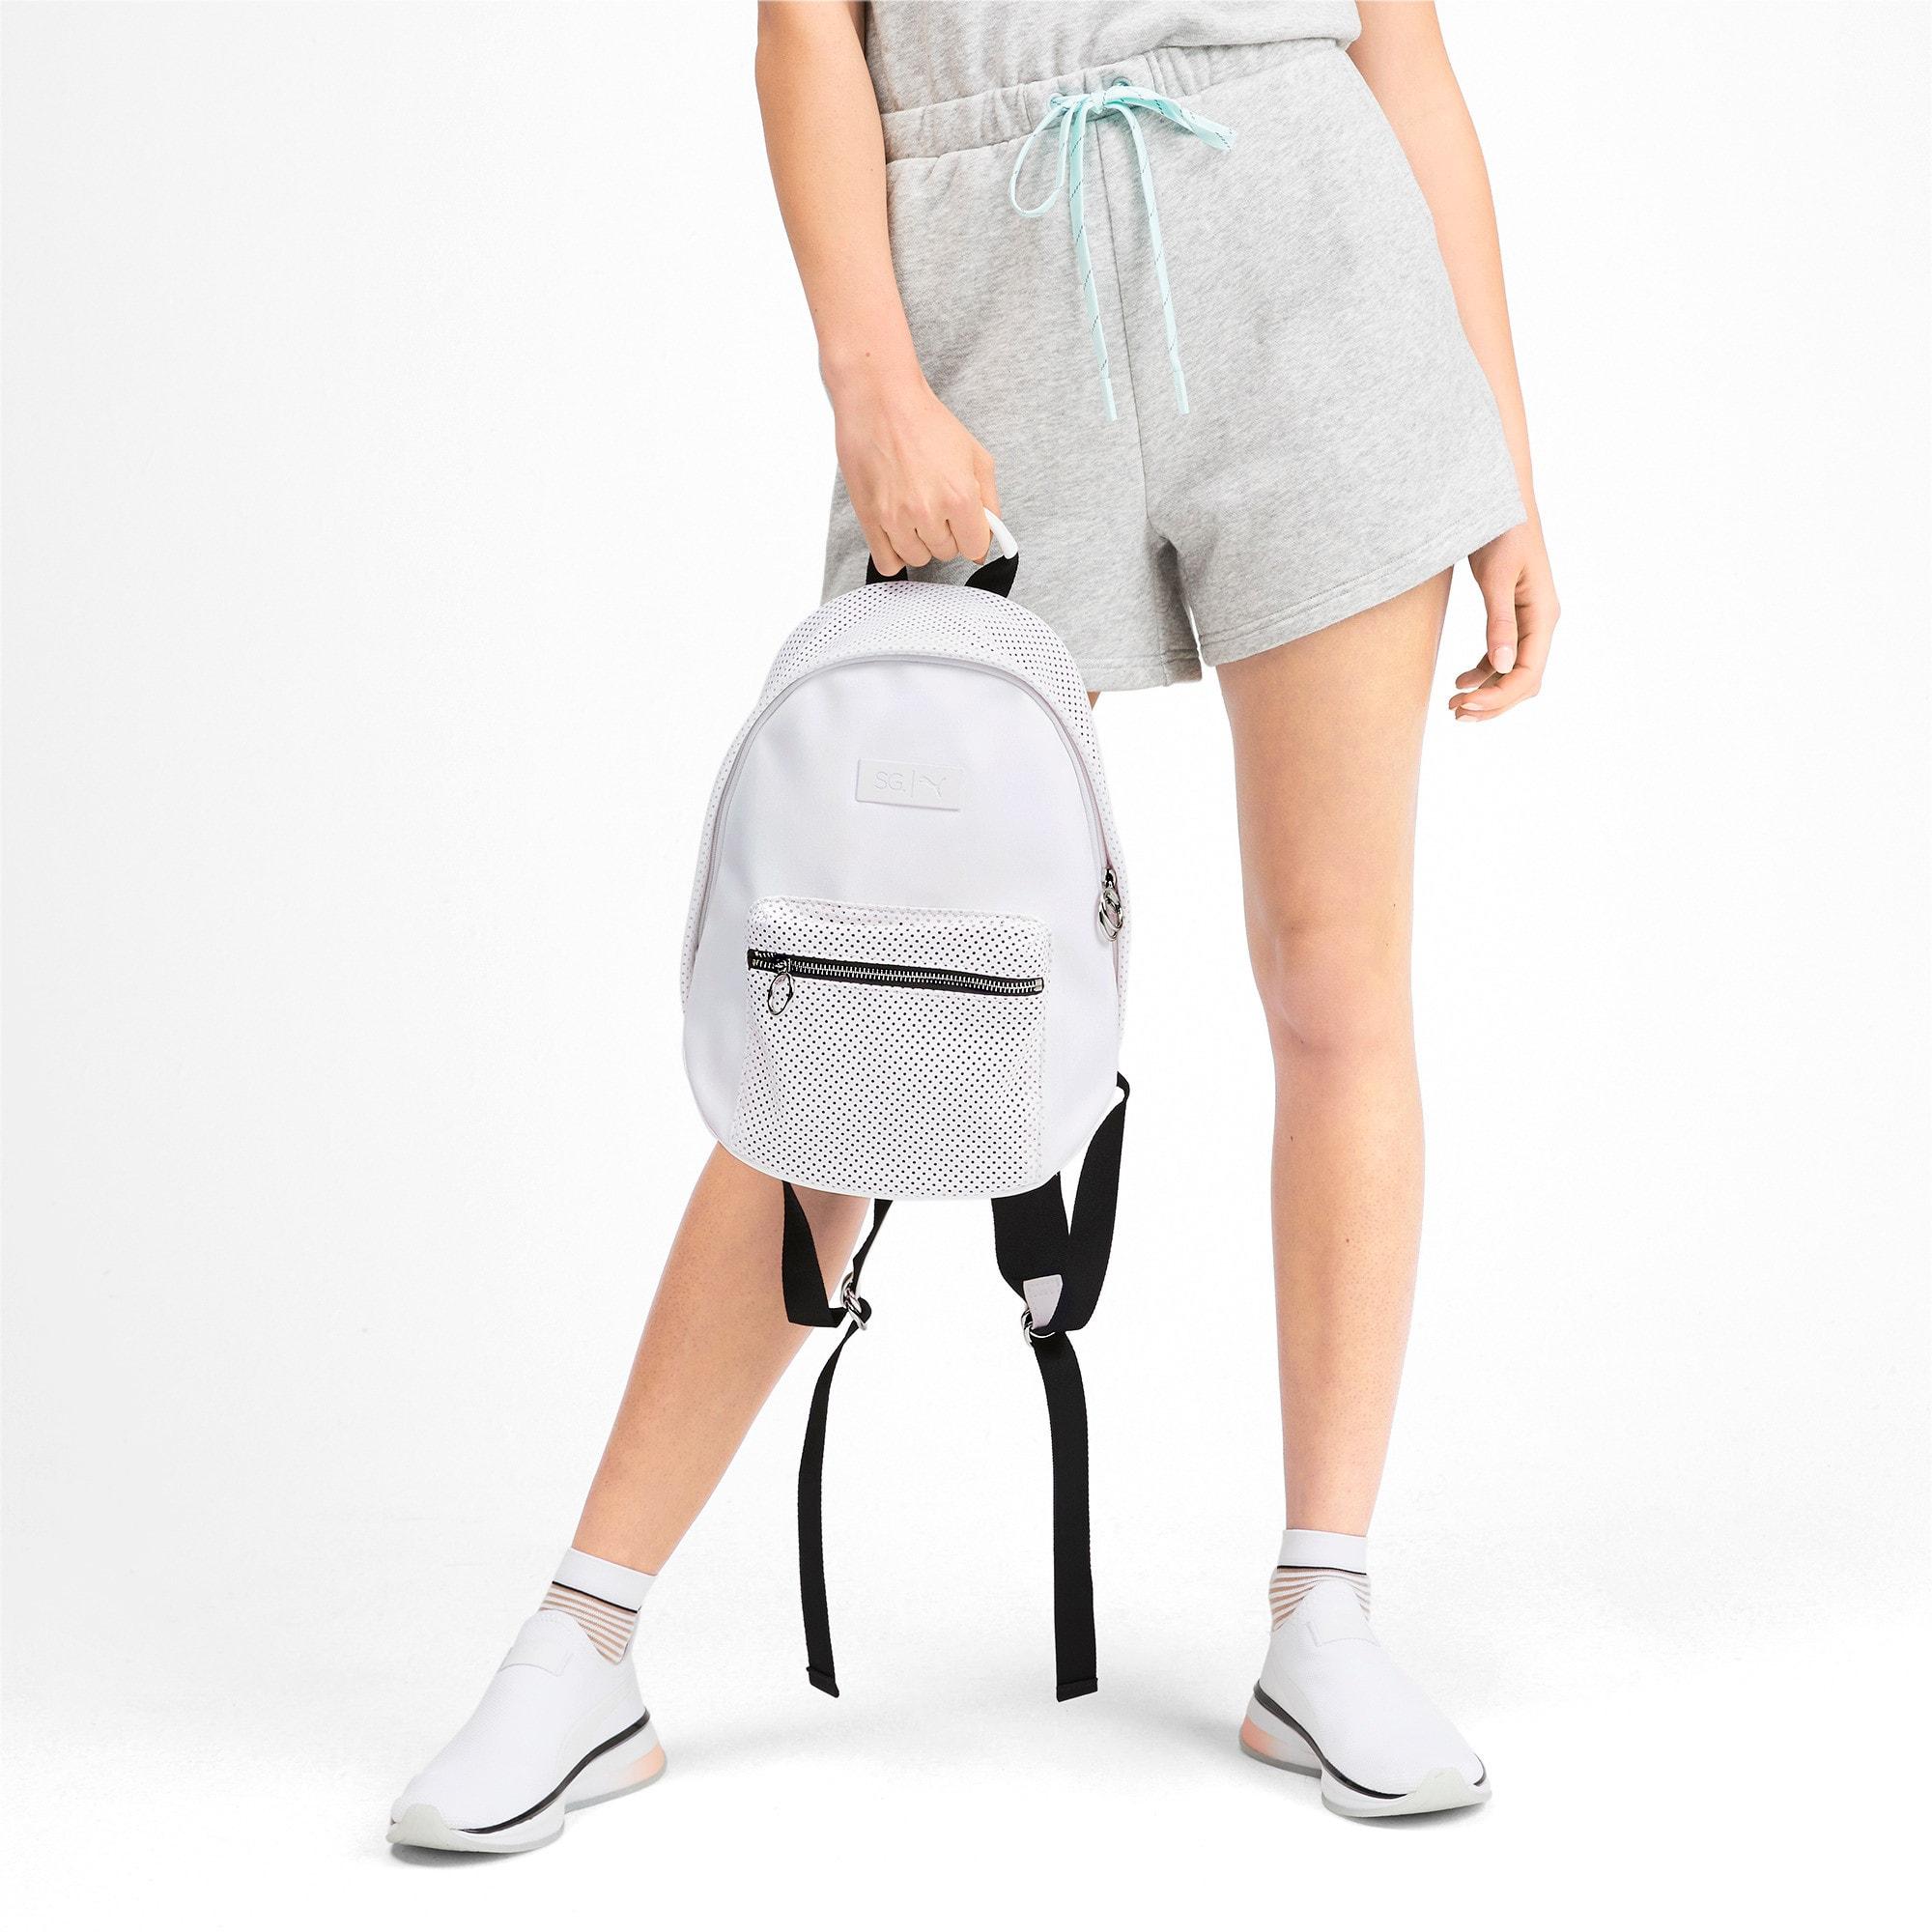 Miniatura 2 de Mochila SG x PUMA Style, Puma White, mediano